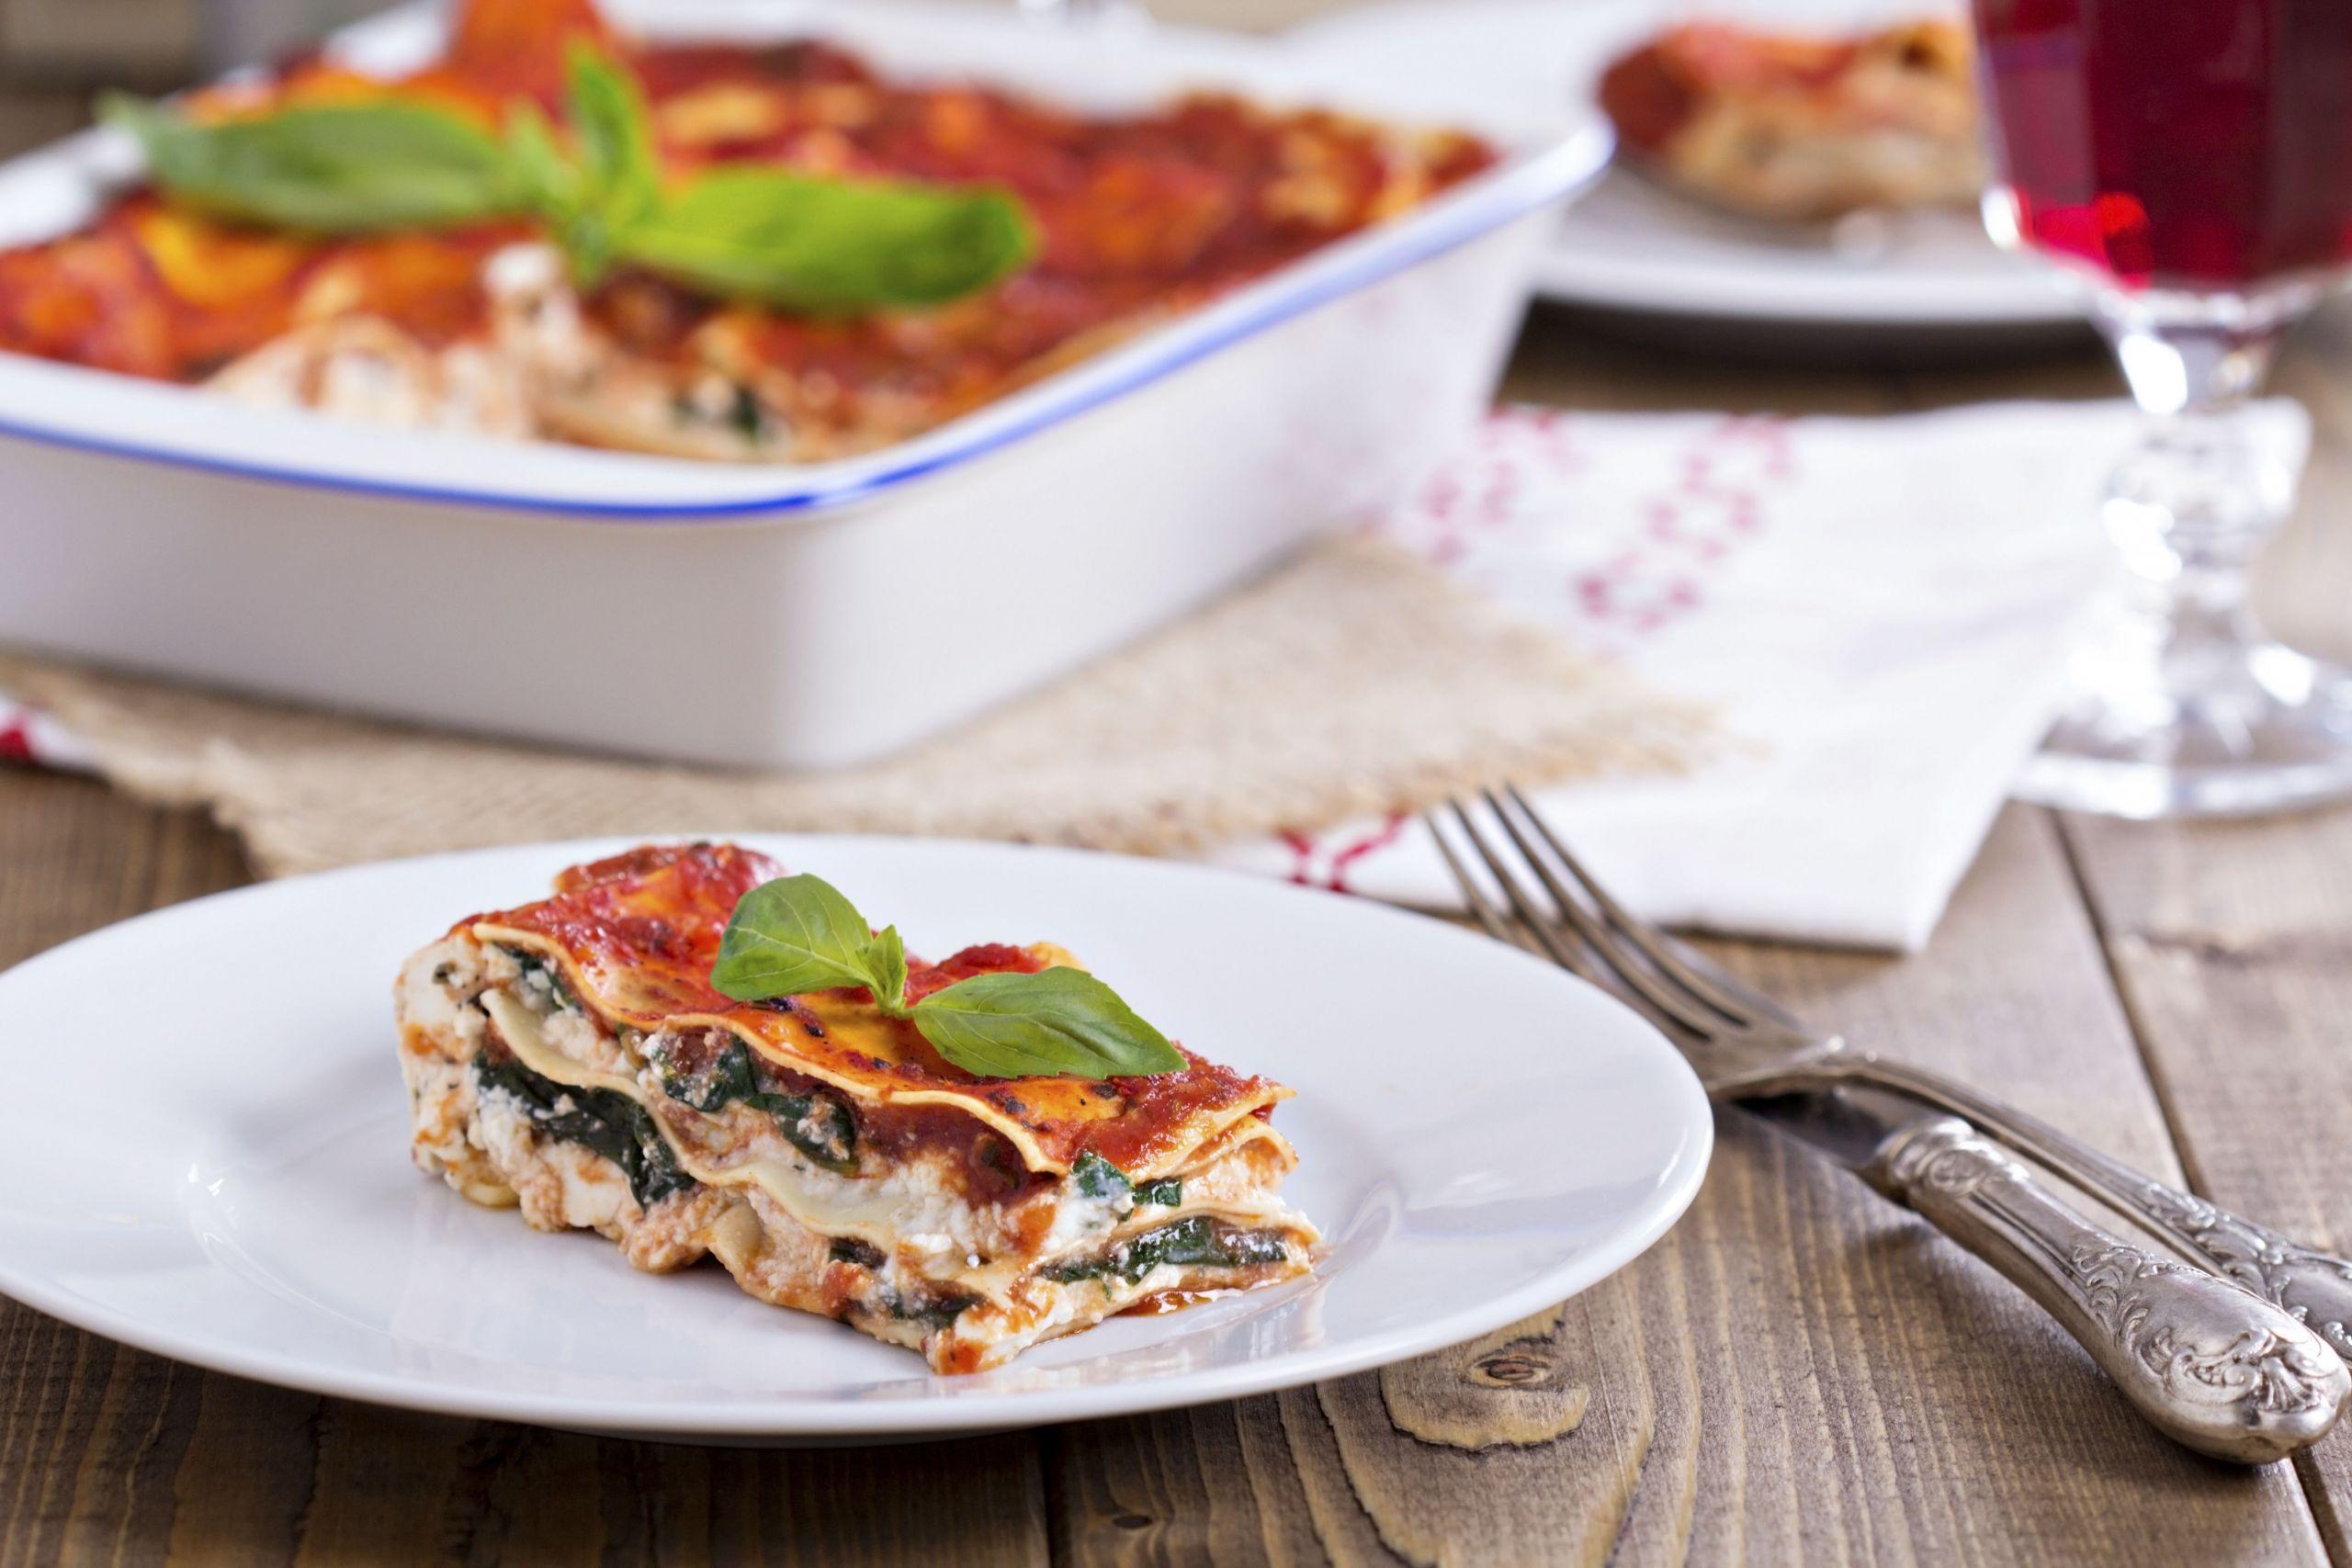 Vegetarian Lasagna Epicurious  Lasagna is the pie of dinners